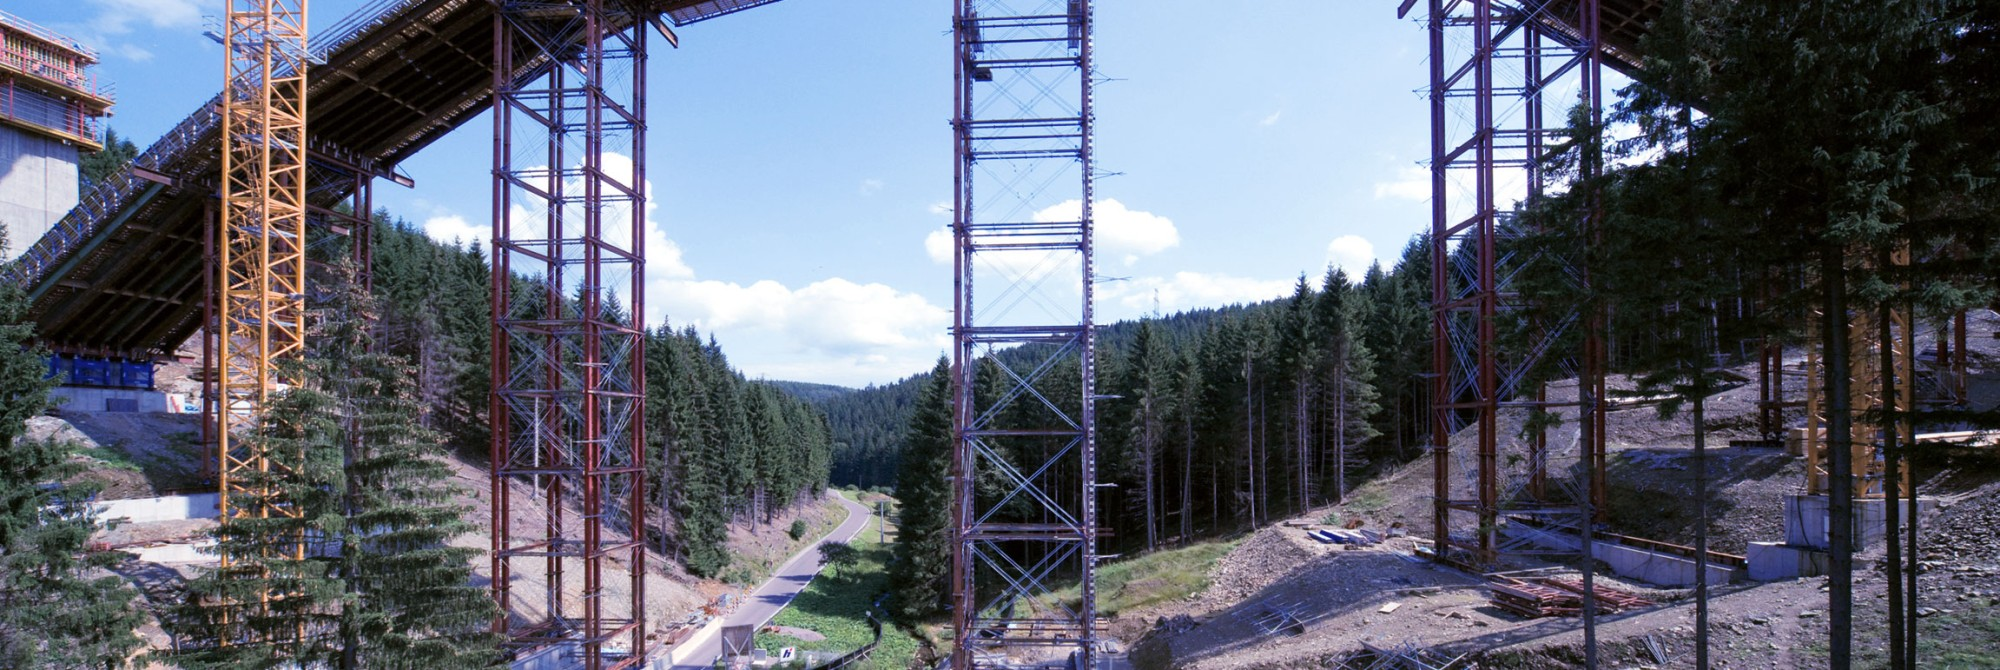 Innovative: Our stationary scaffolds